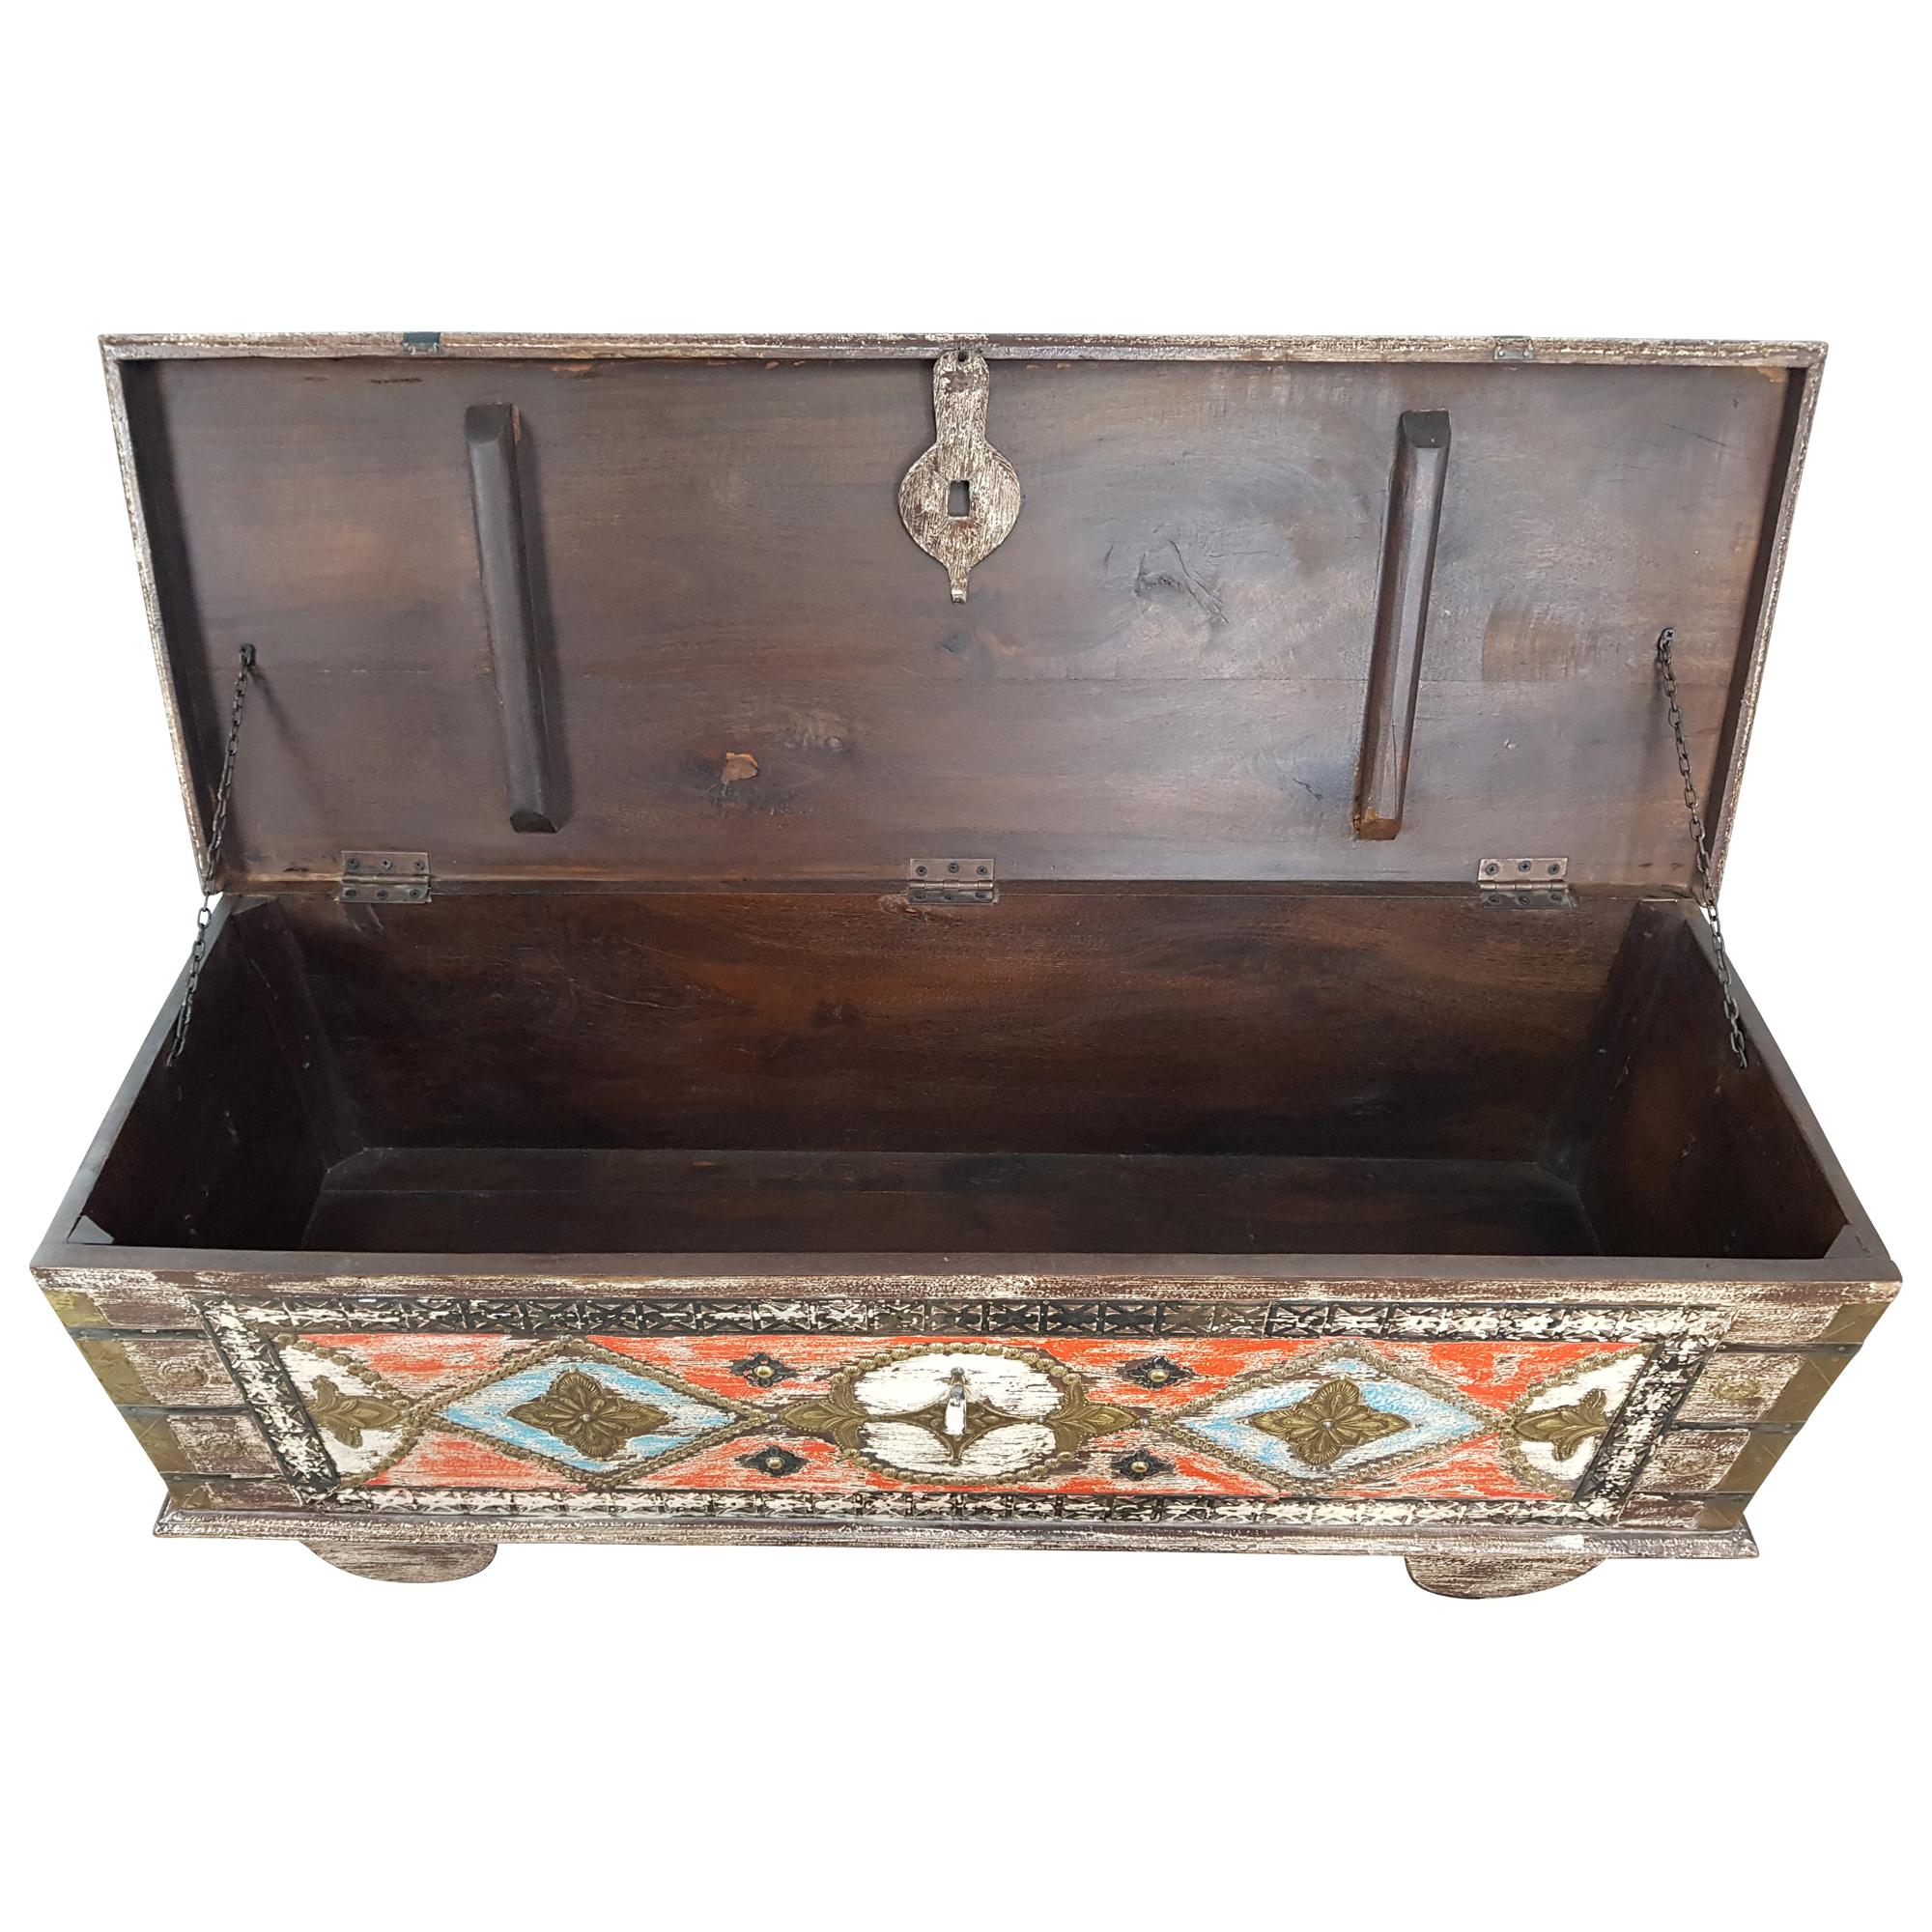 Truhe Kiste Holztruhe Vintage Massiv Box Aus Altholz Antik